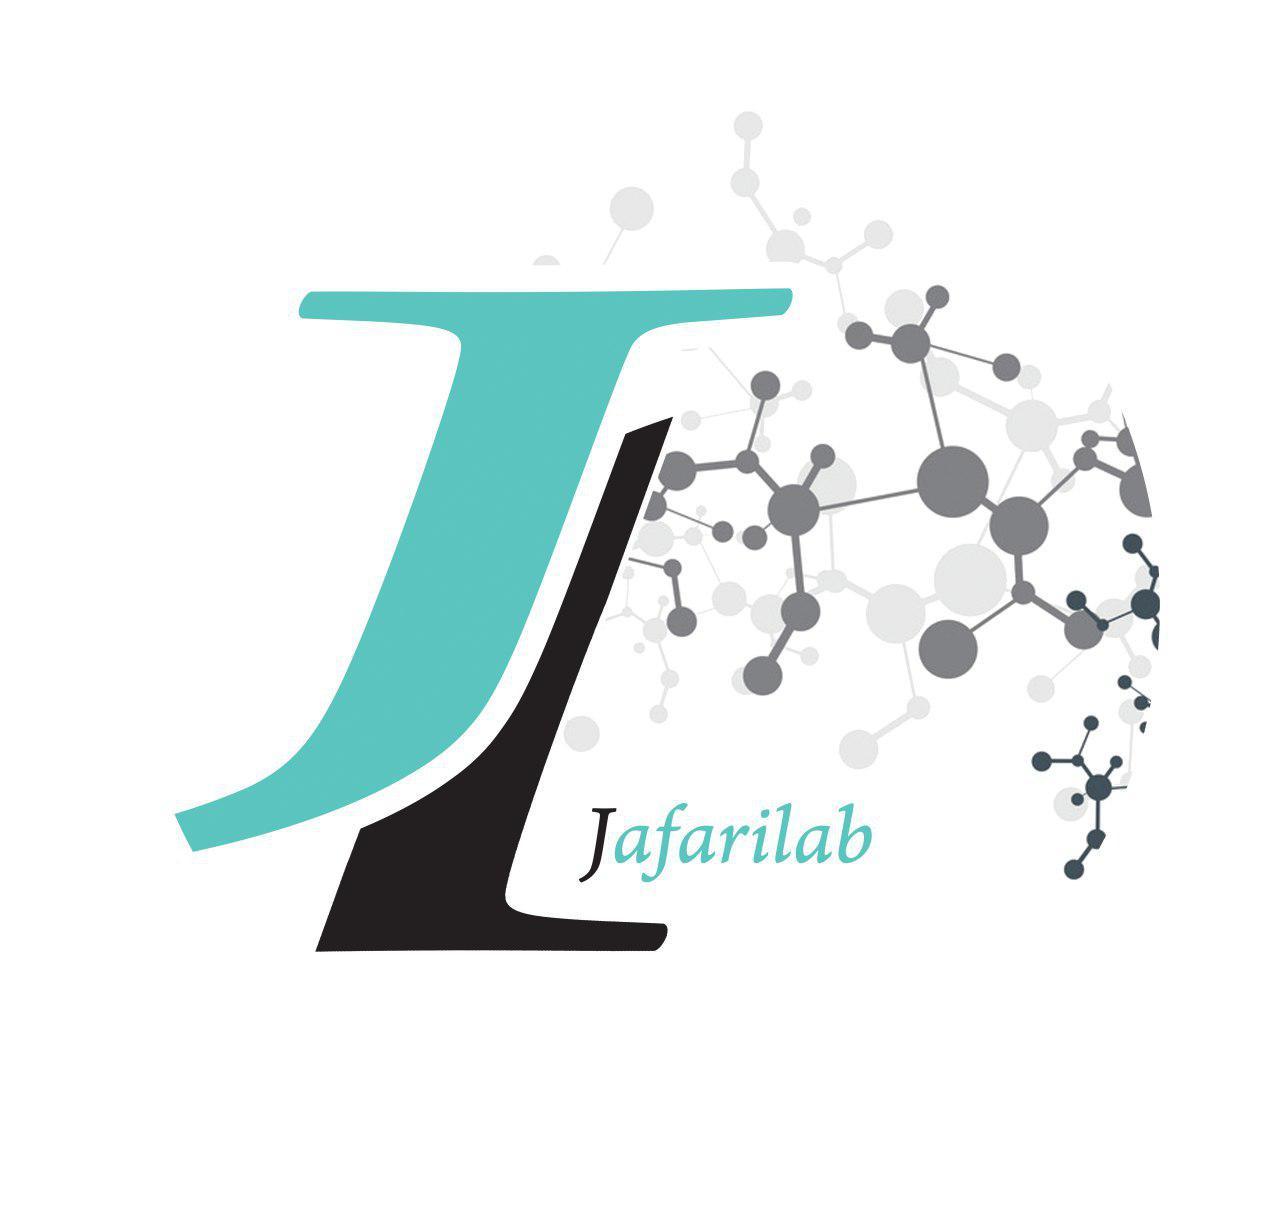 jafari